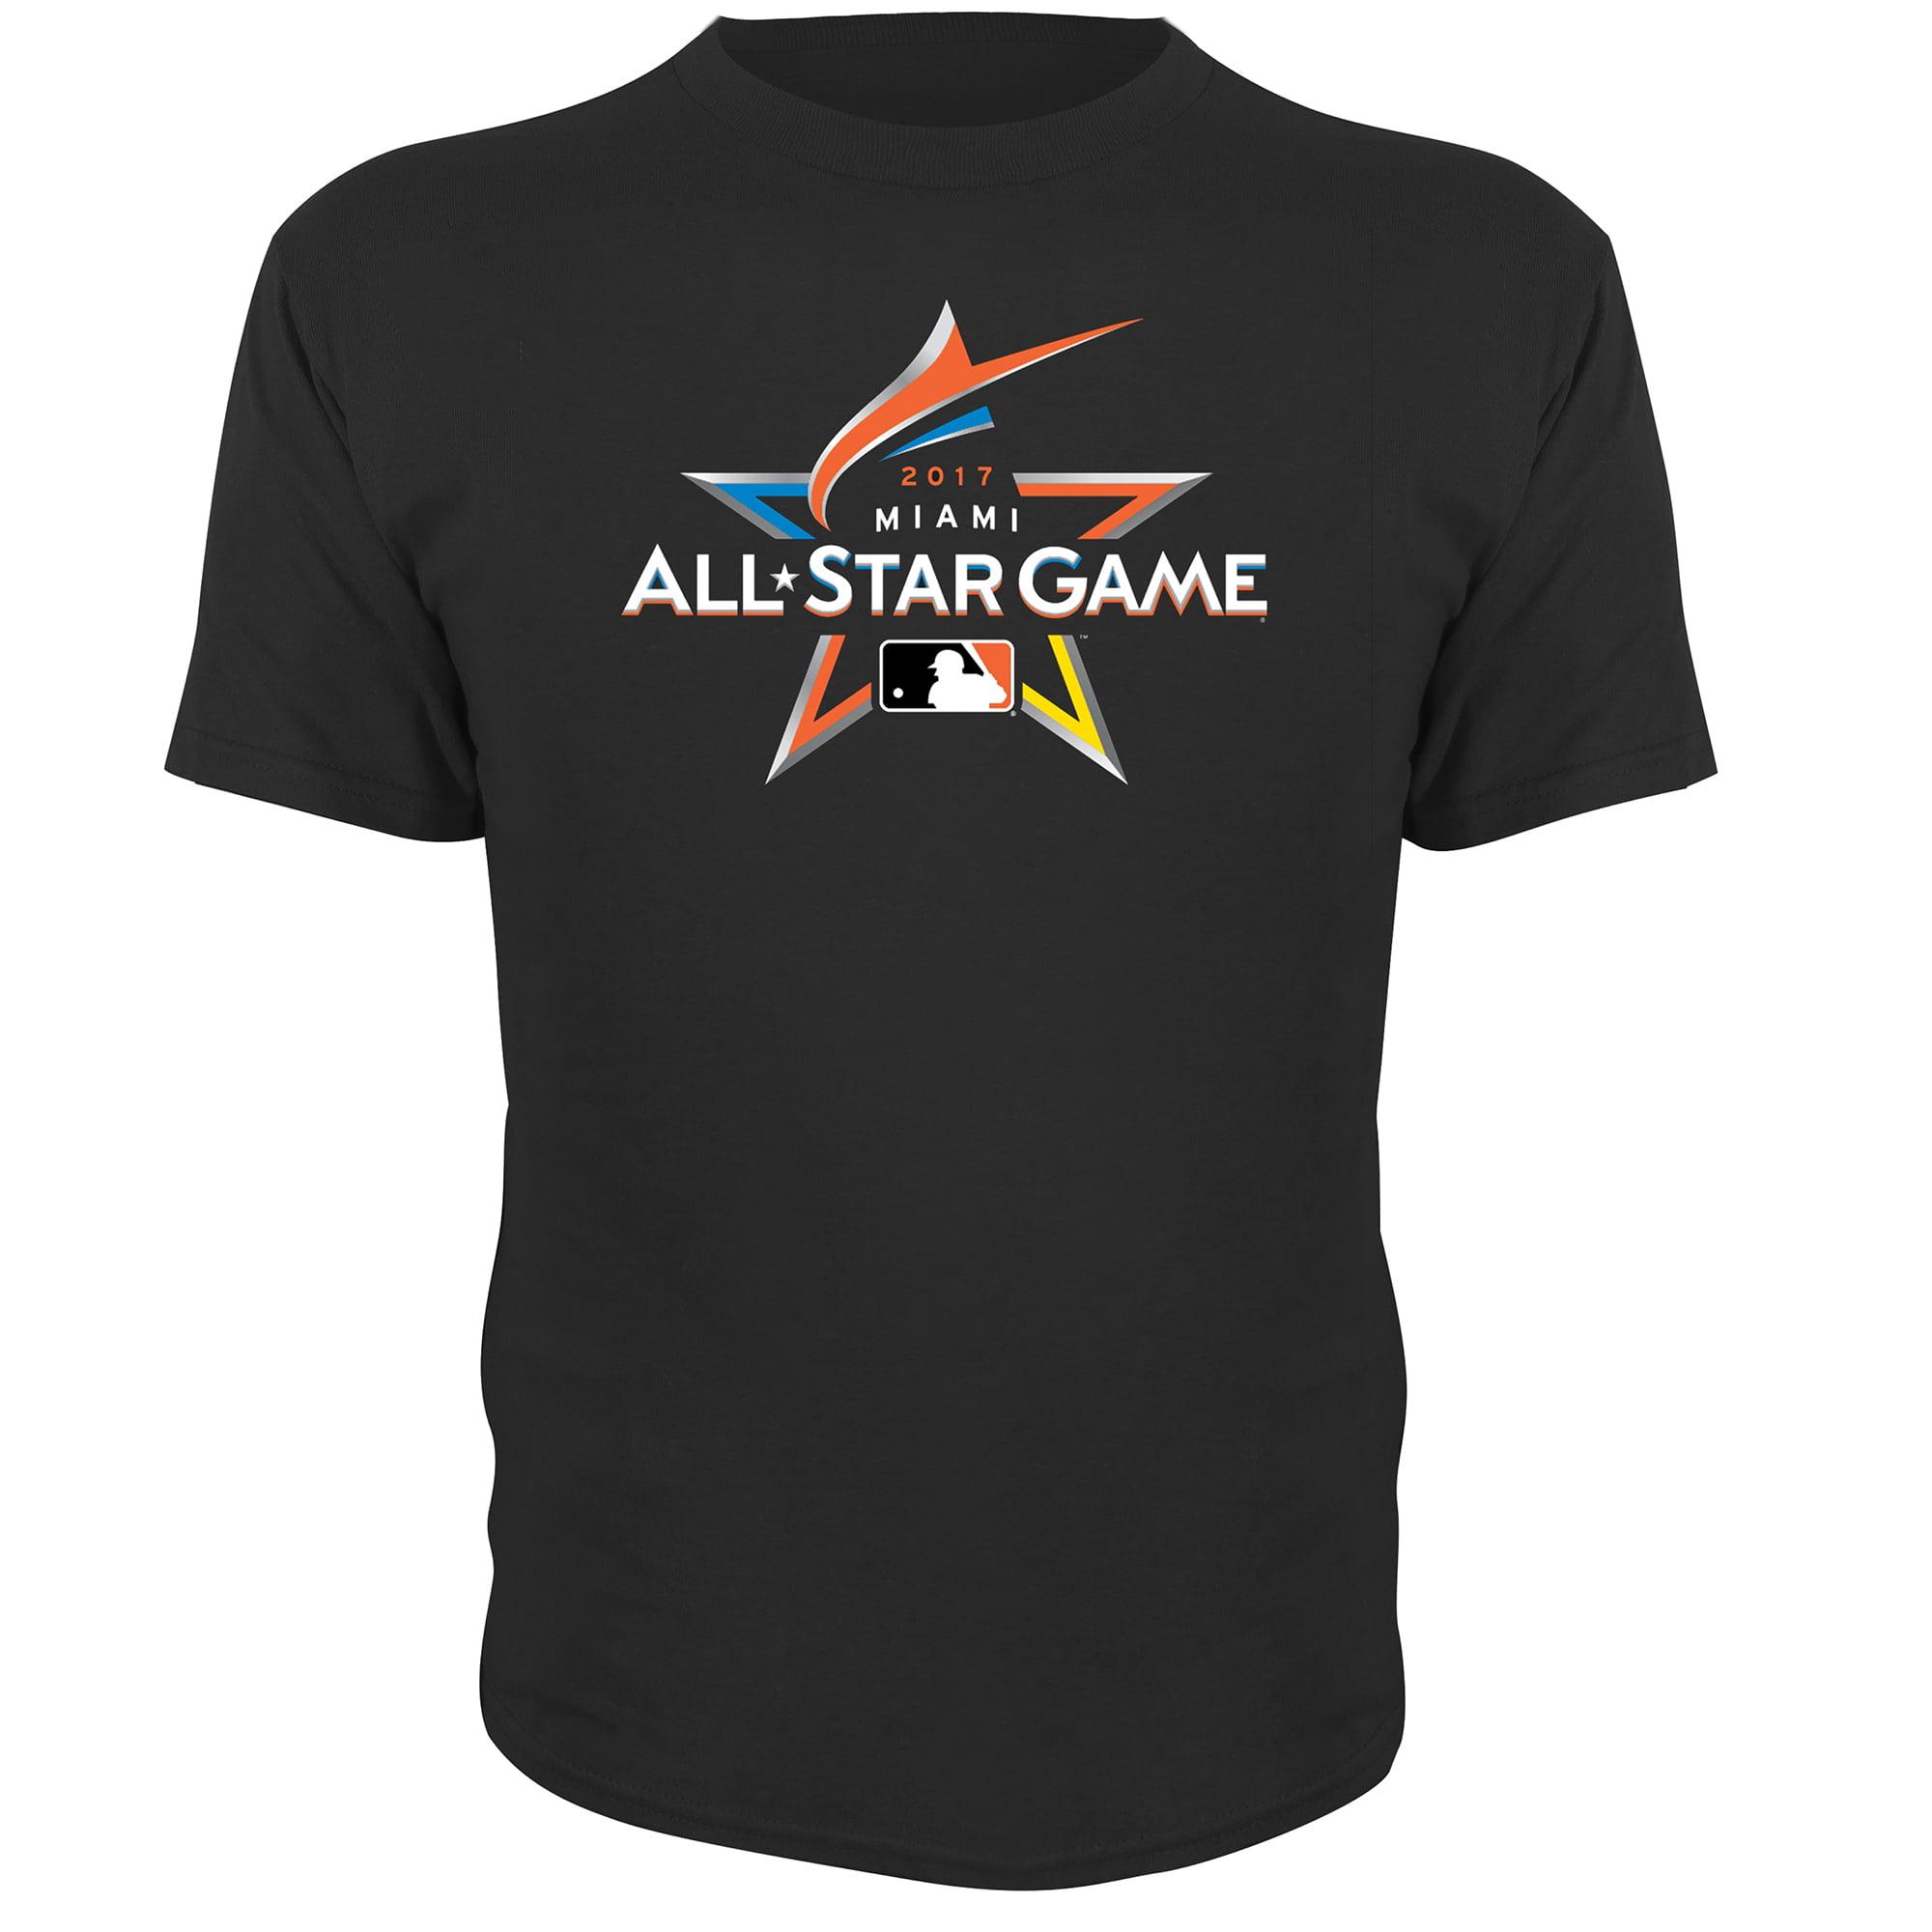 Stitches Youth 2017 MLB All-Star Game T-Shirt - Black